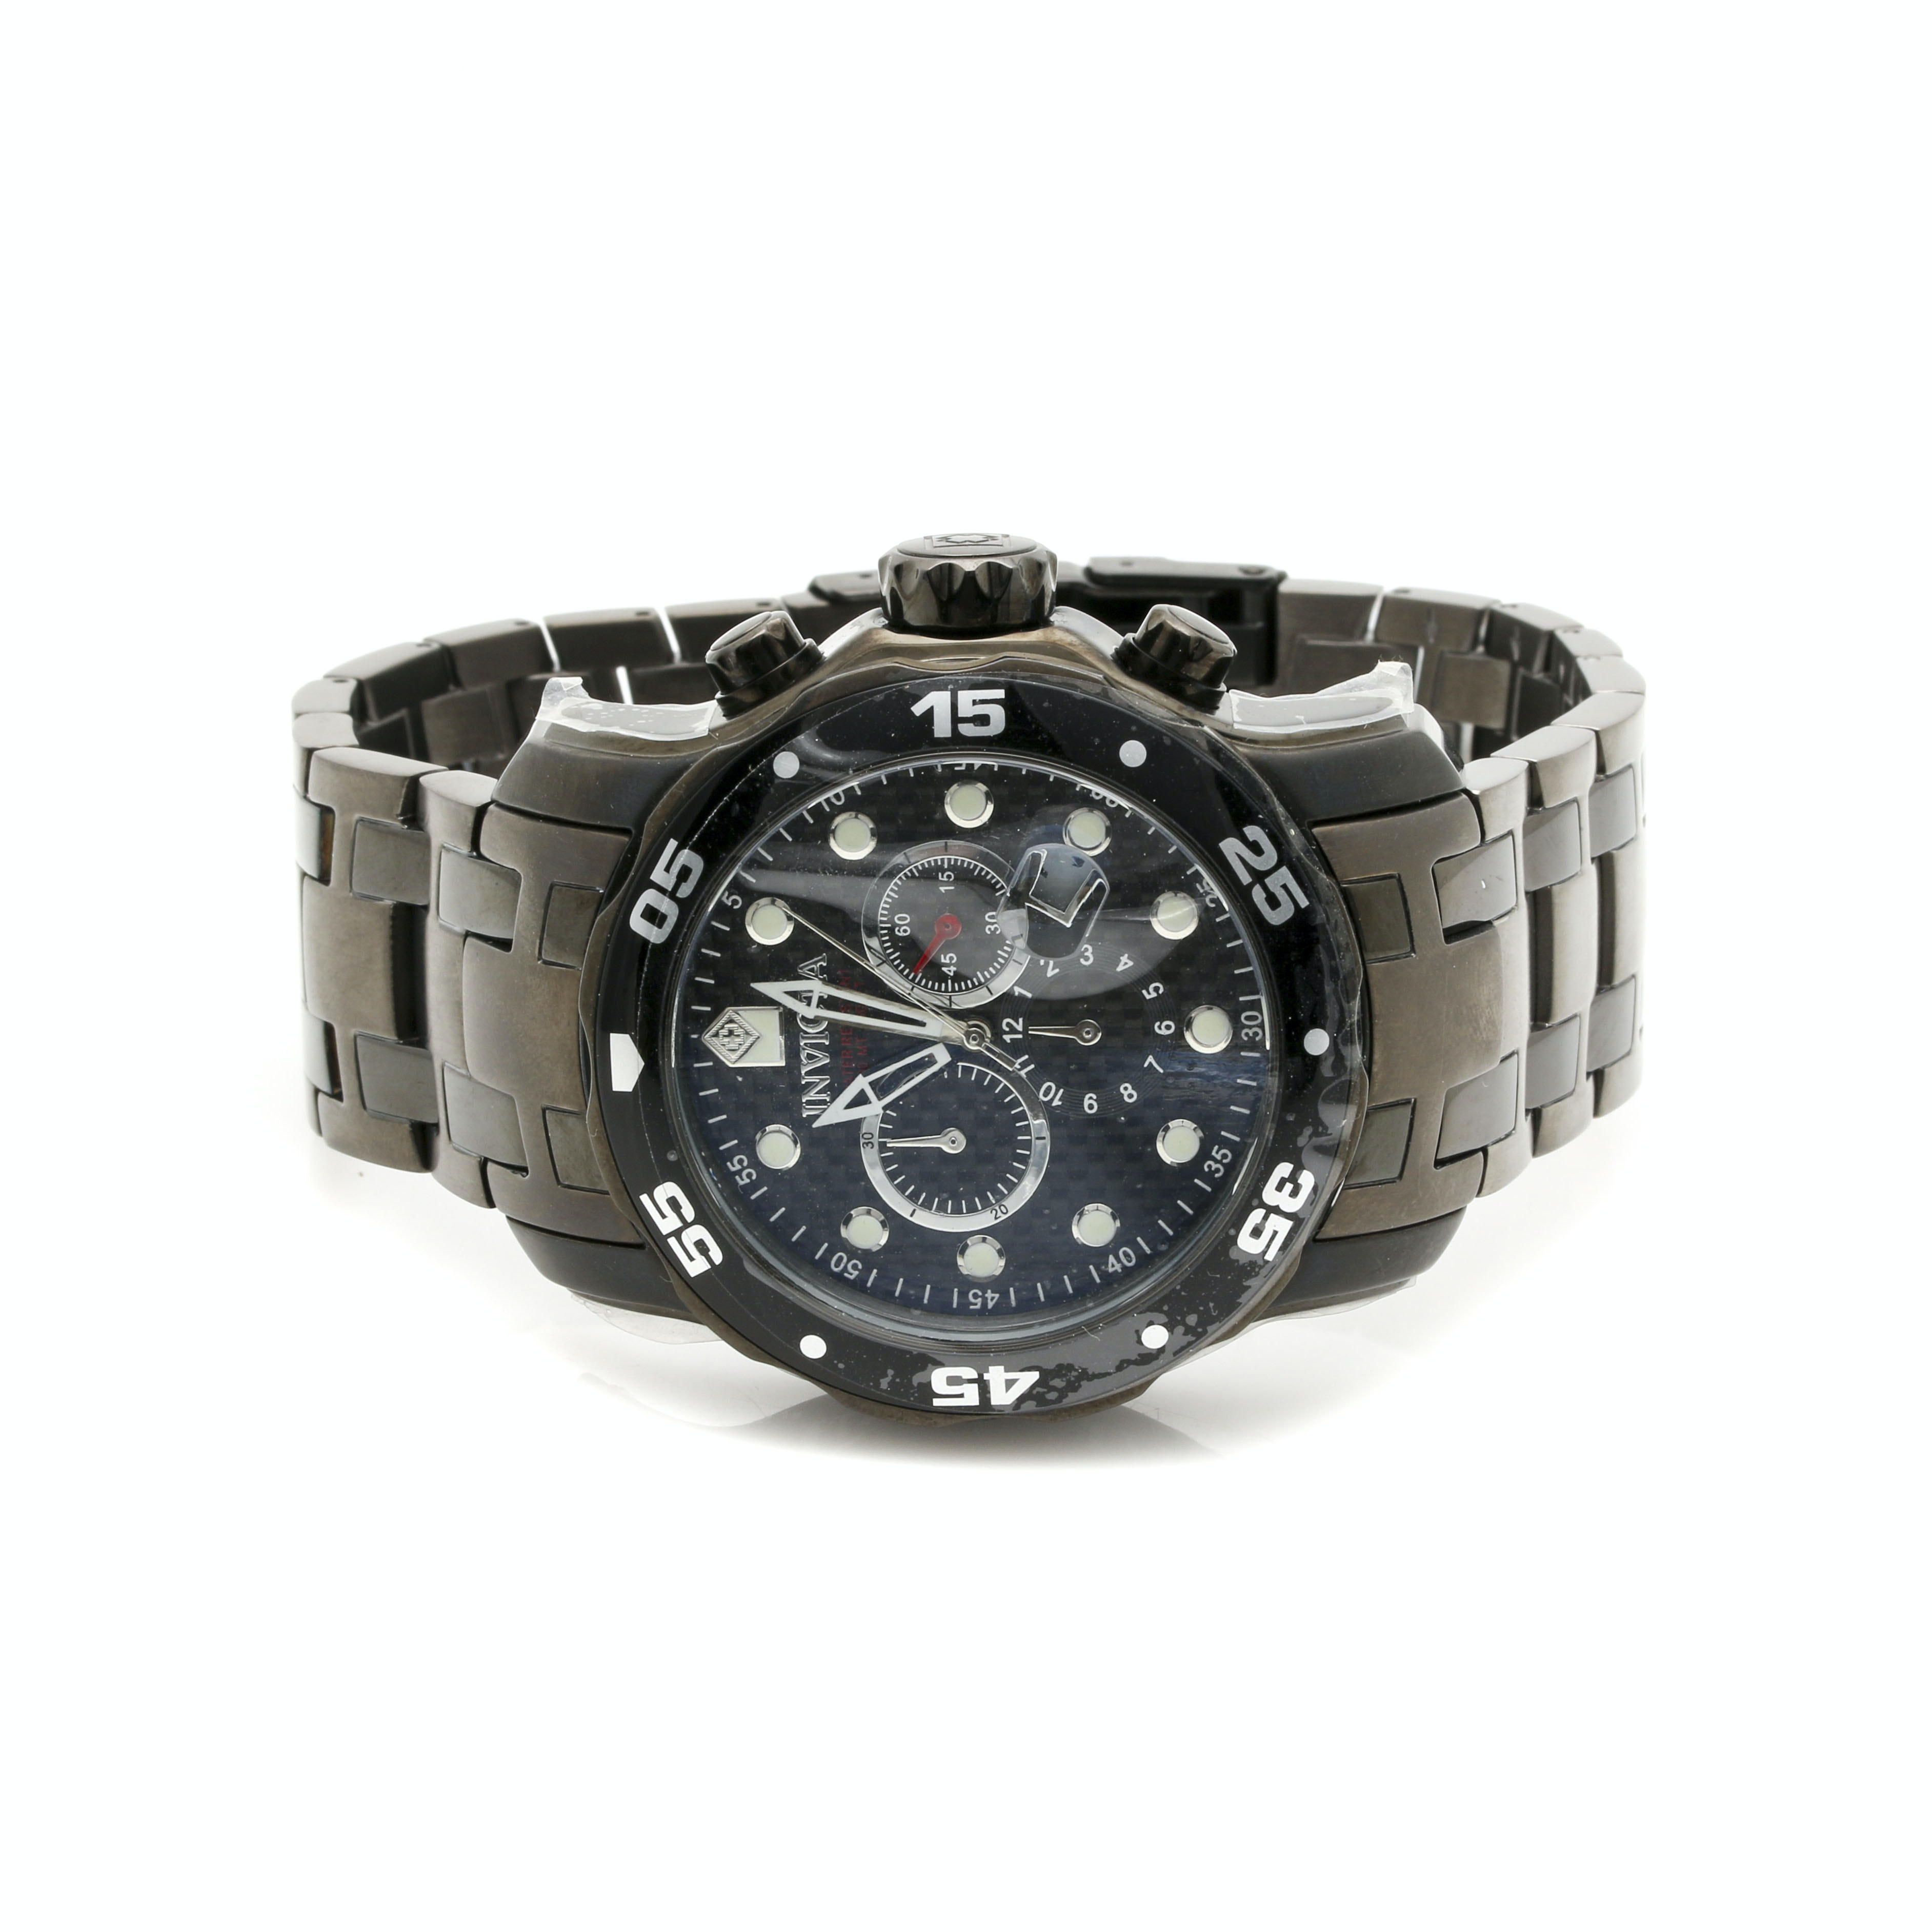 "Invicta ""Pro Diver"" Chronograph Wristwatch"